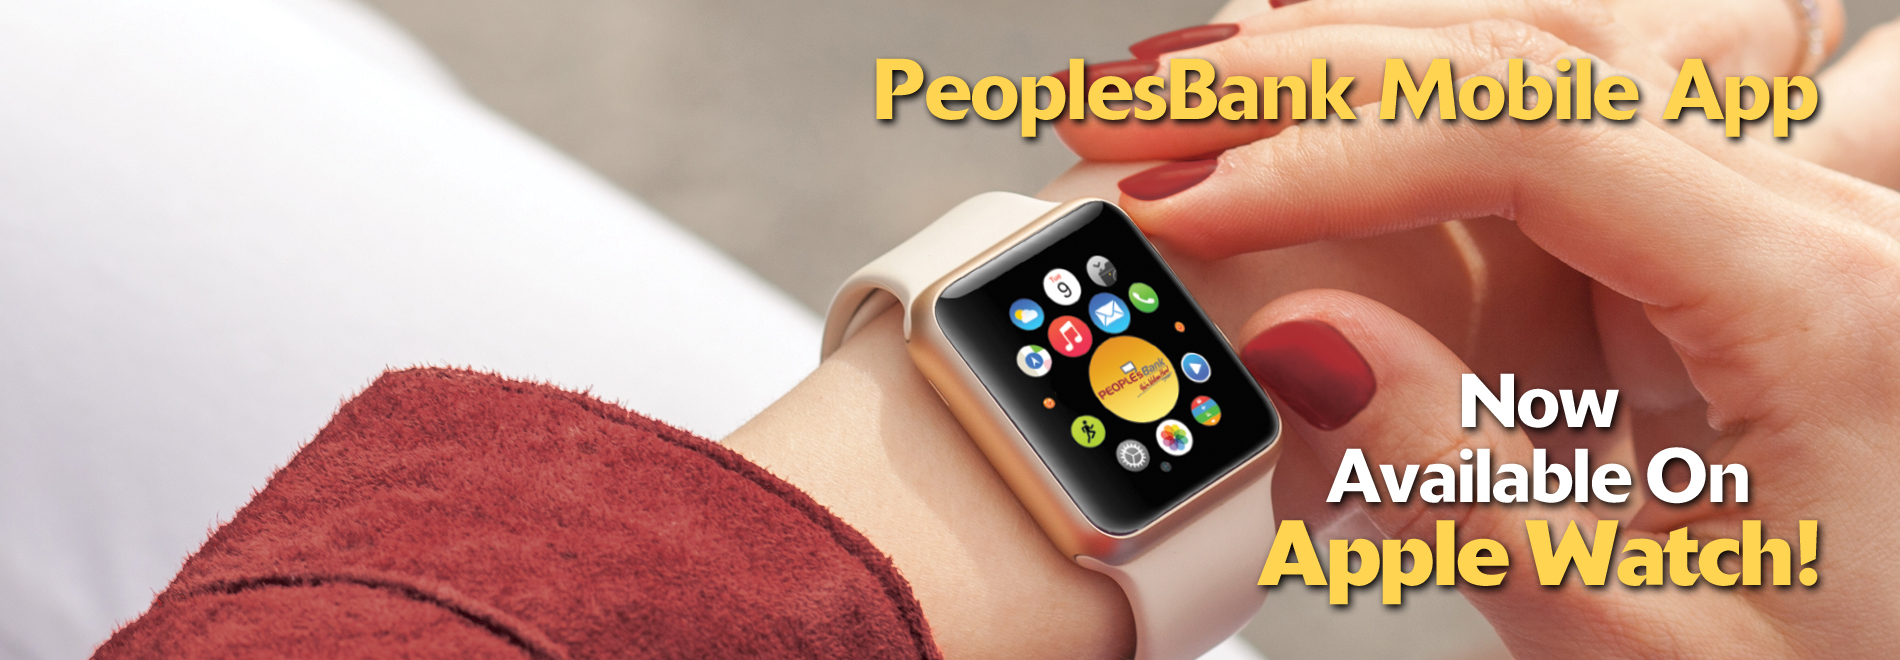 Mobile App apple watch